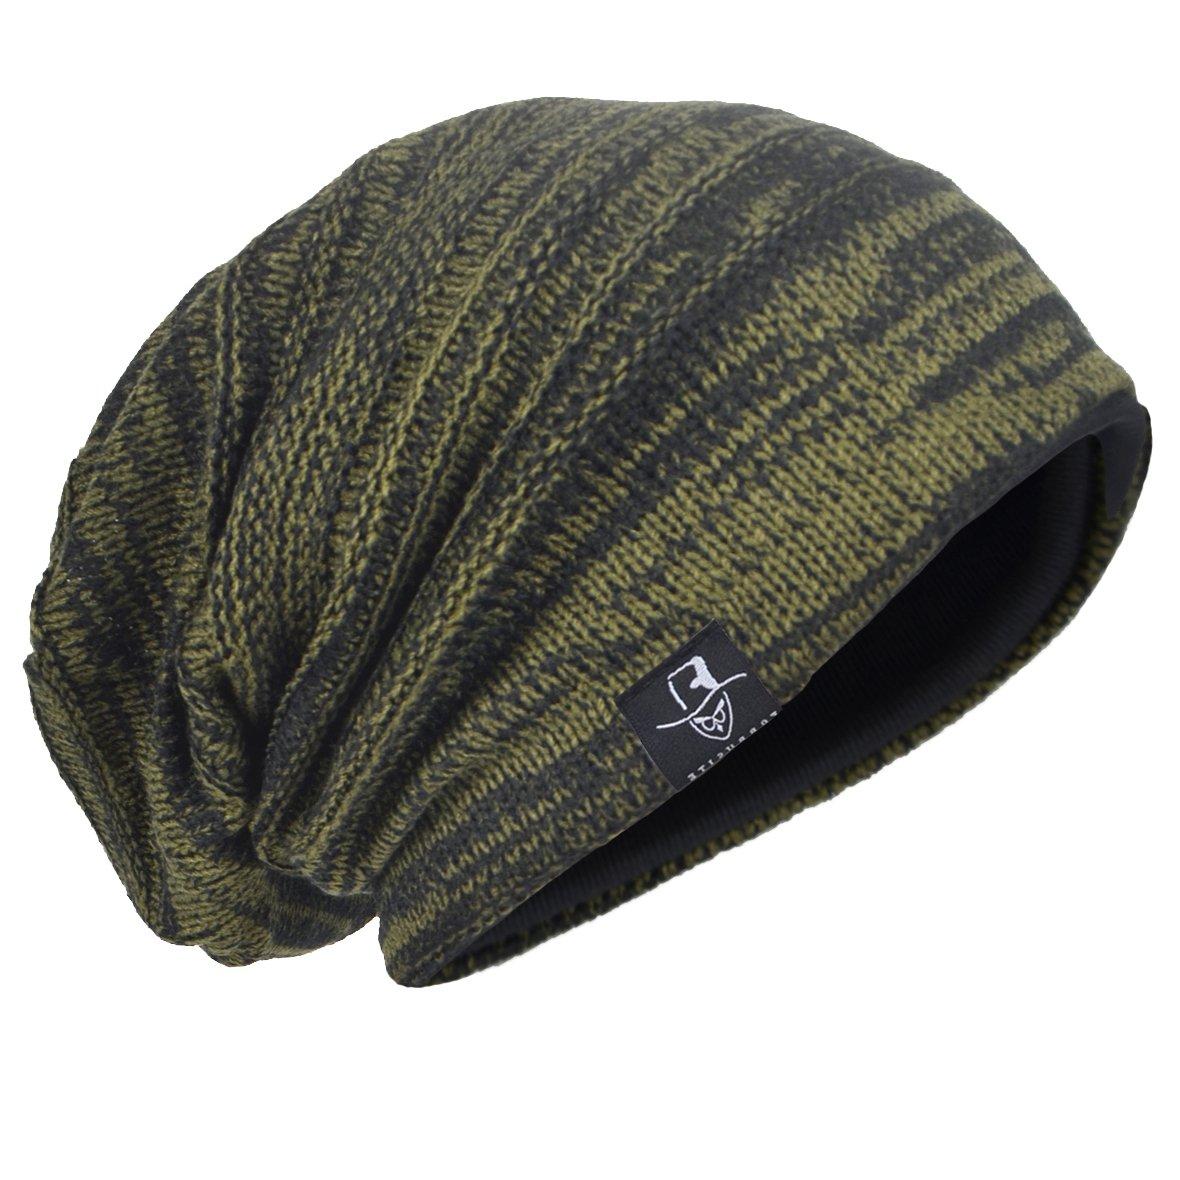 cfb6ee30174 HISSHE Men Oversize Skull Slouch Beanie Large Skullcap Knit Hat (AGreen1)  at Amazon Men s Clothing store